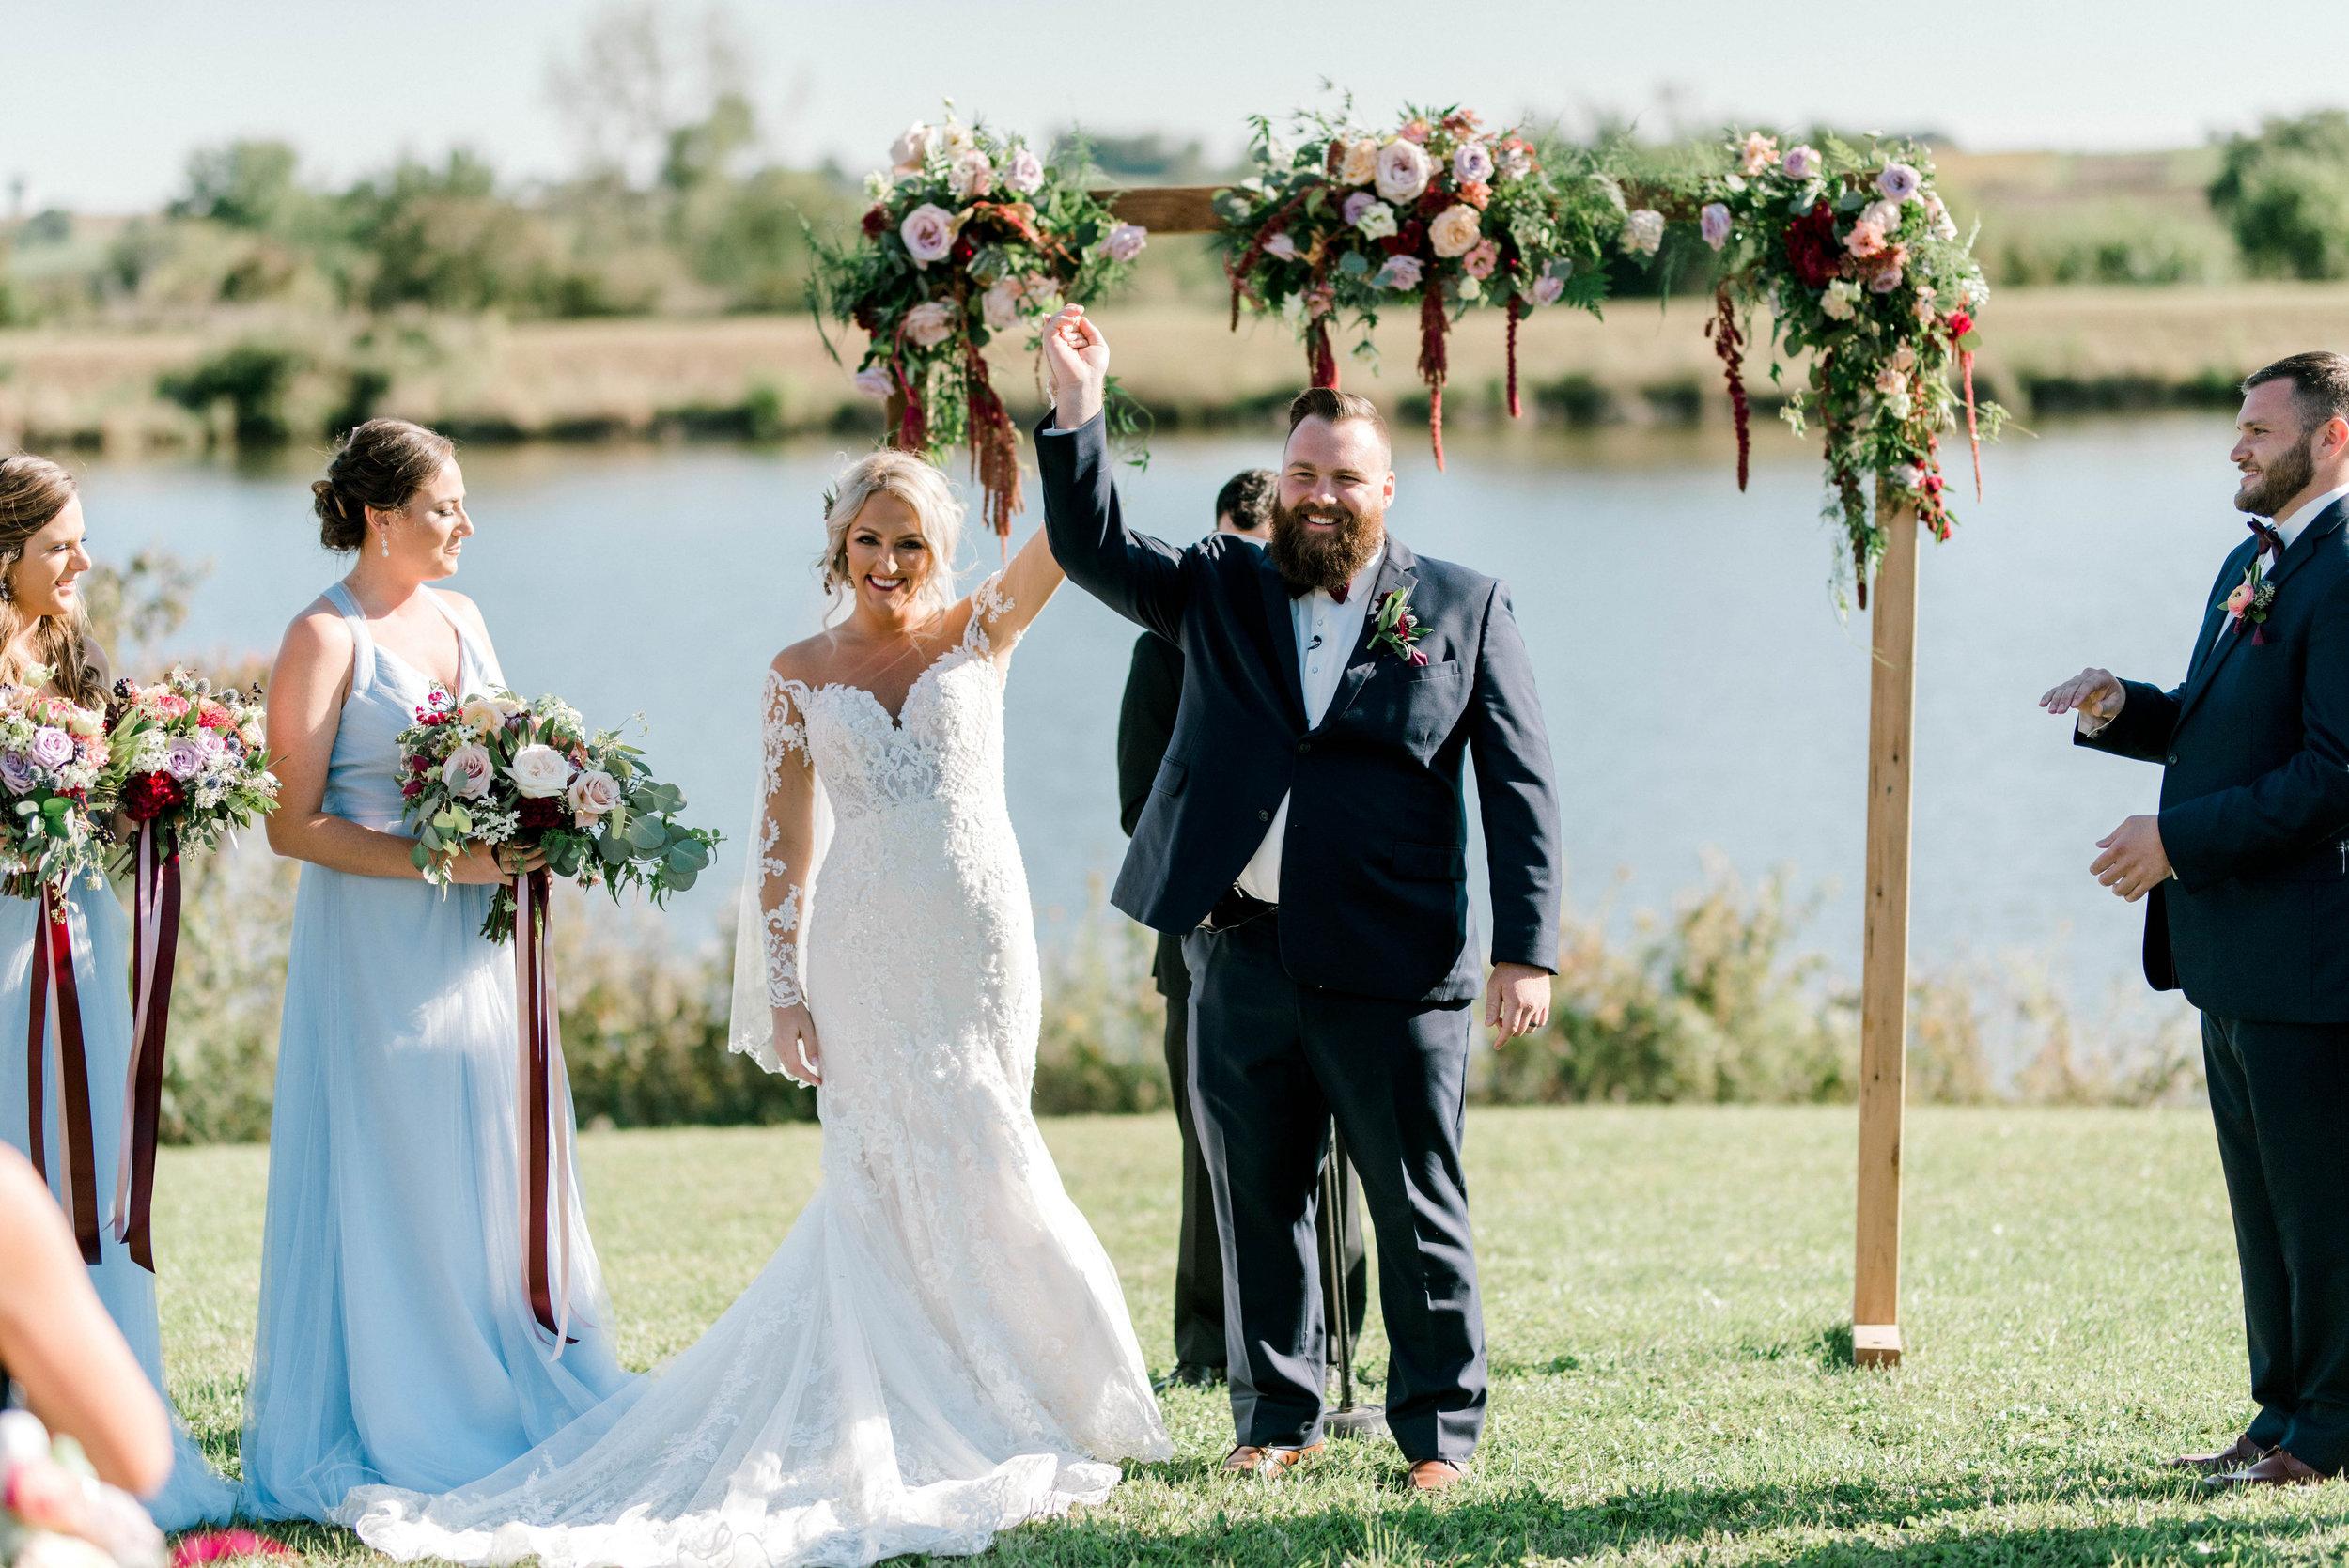 Ryan Alexa Married-Formals Ceremony-0188.jpg